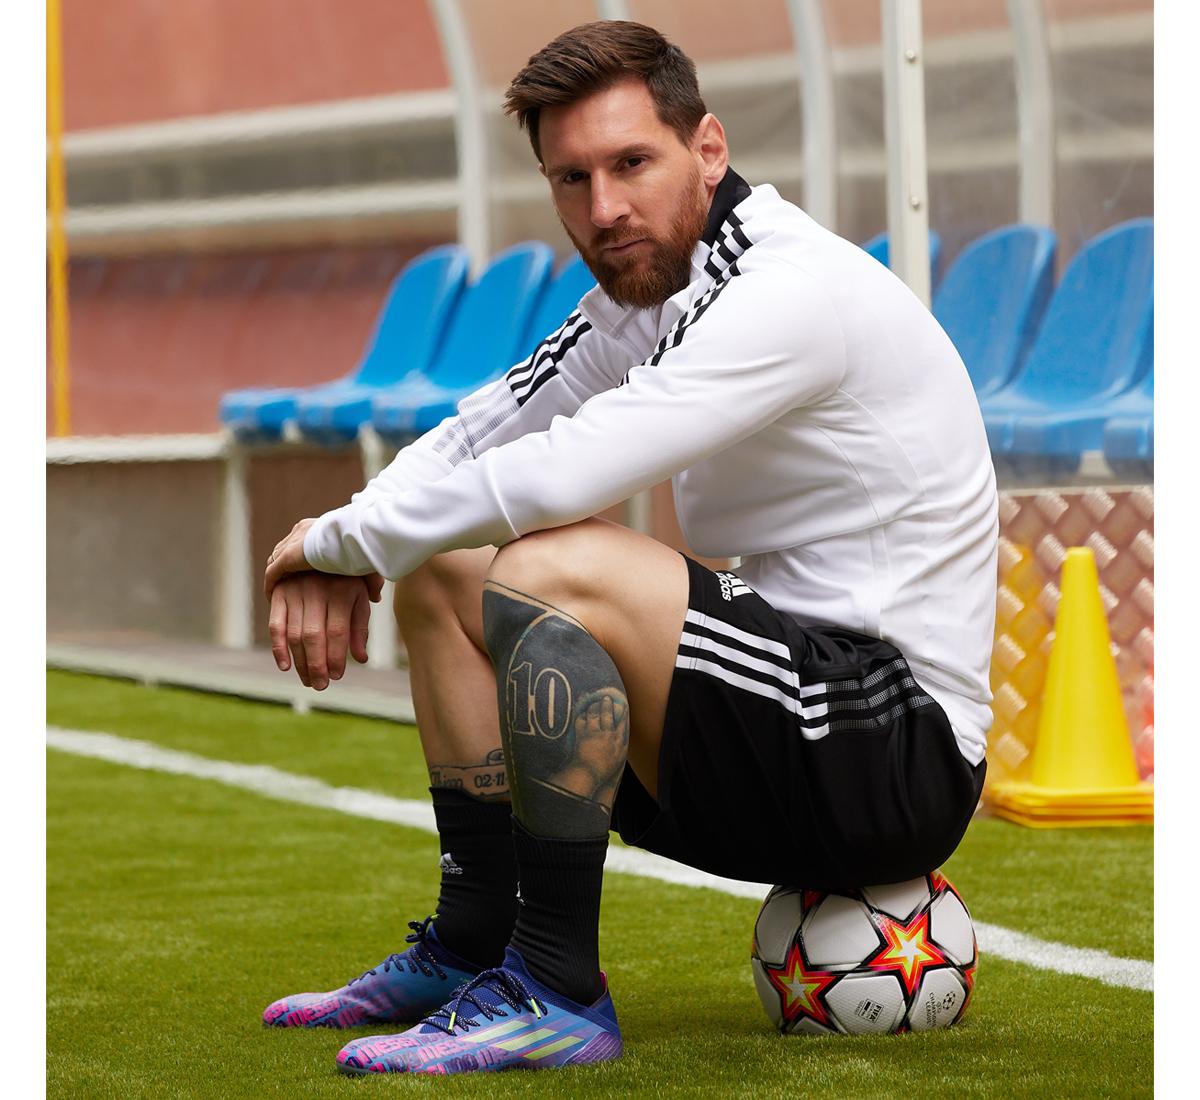 adidas® X Soccer Cleats